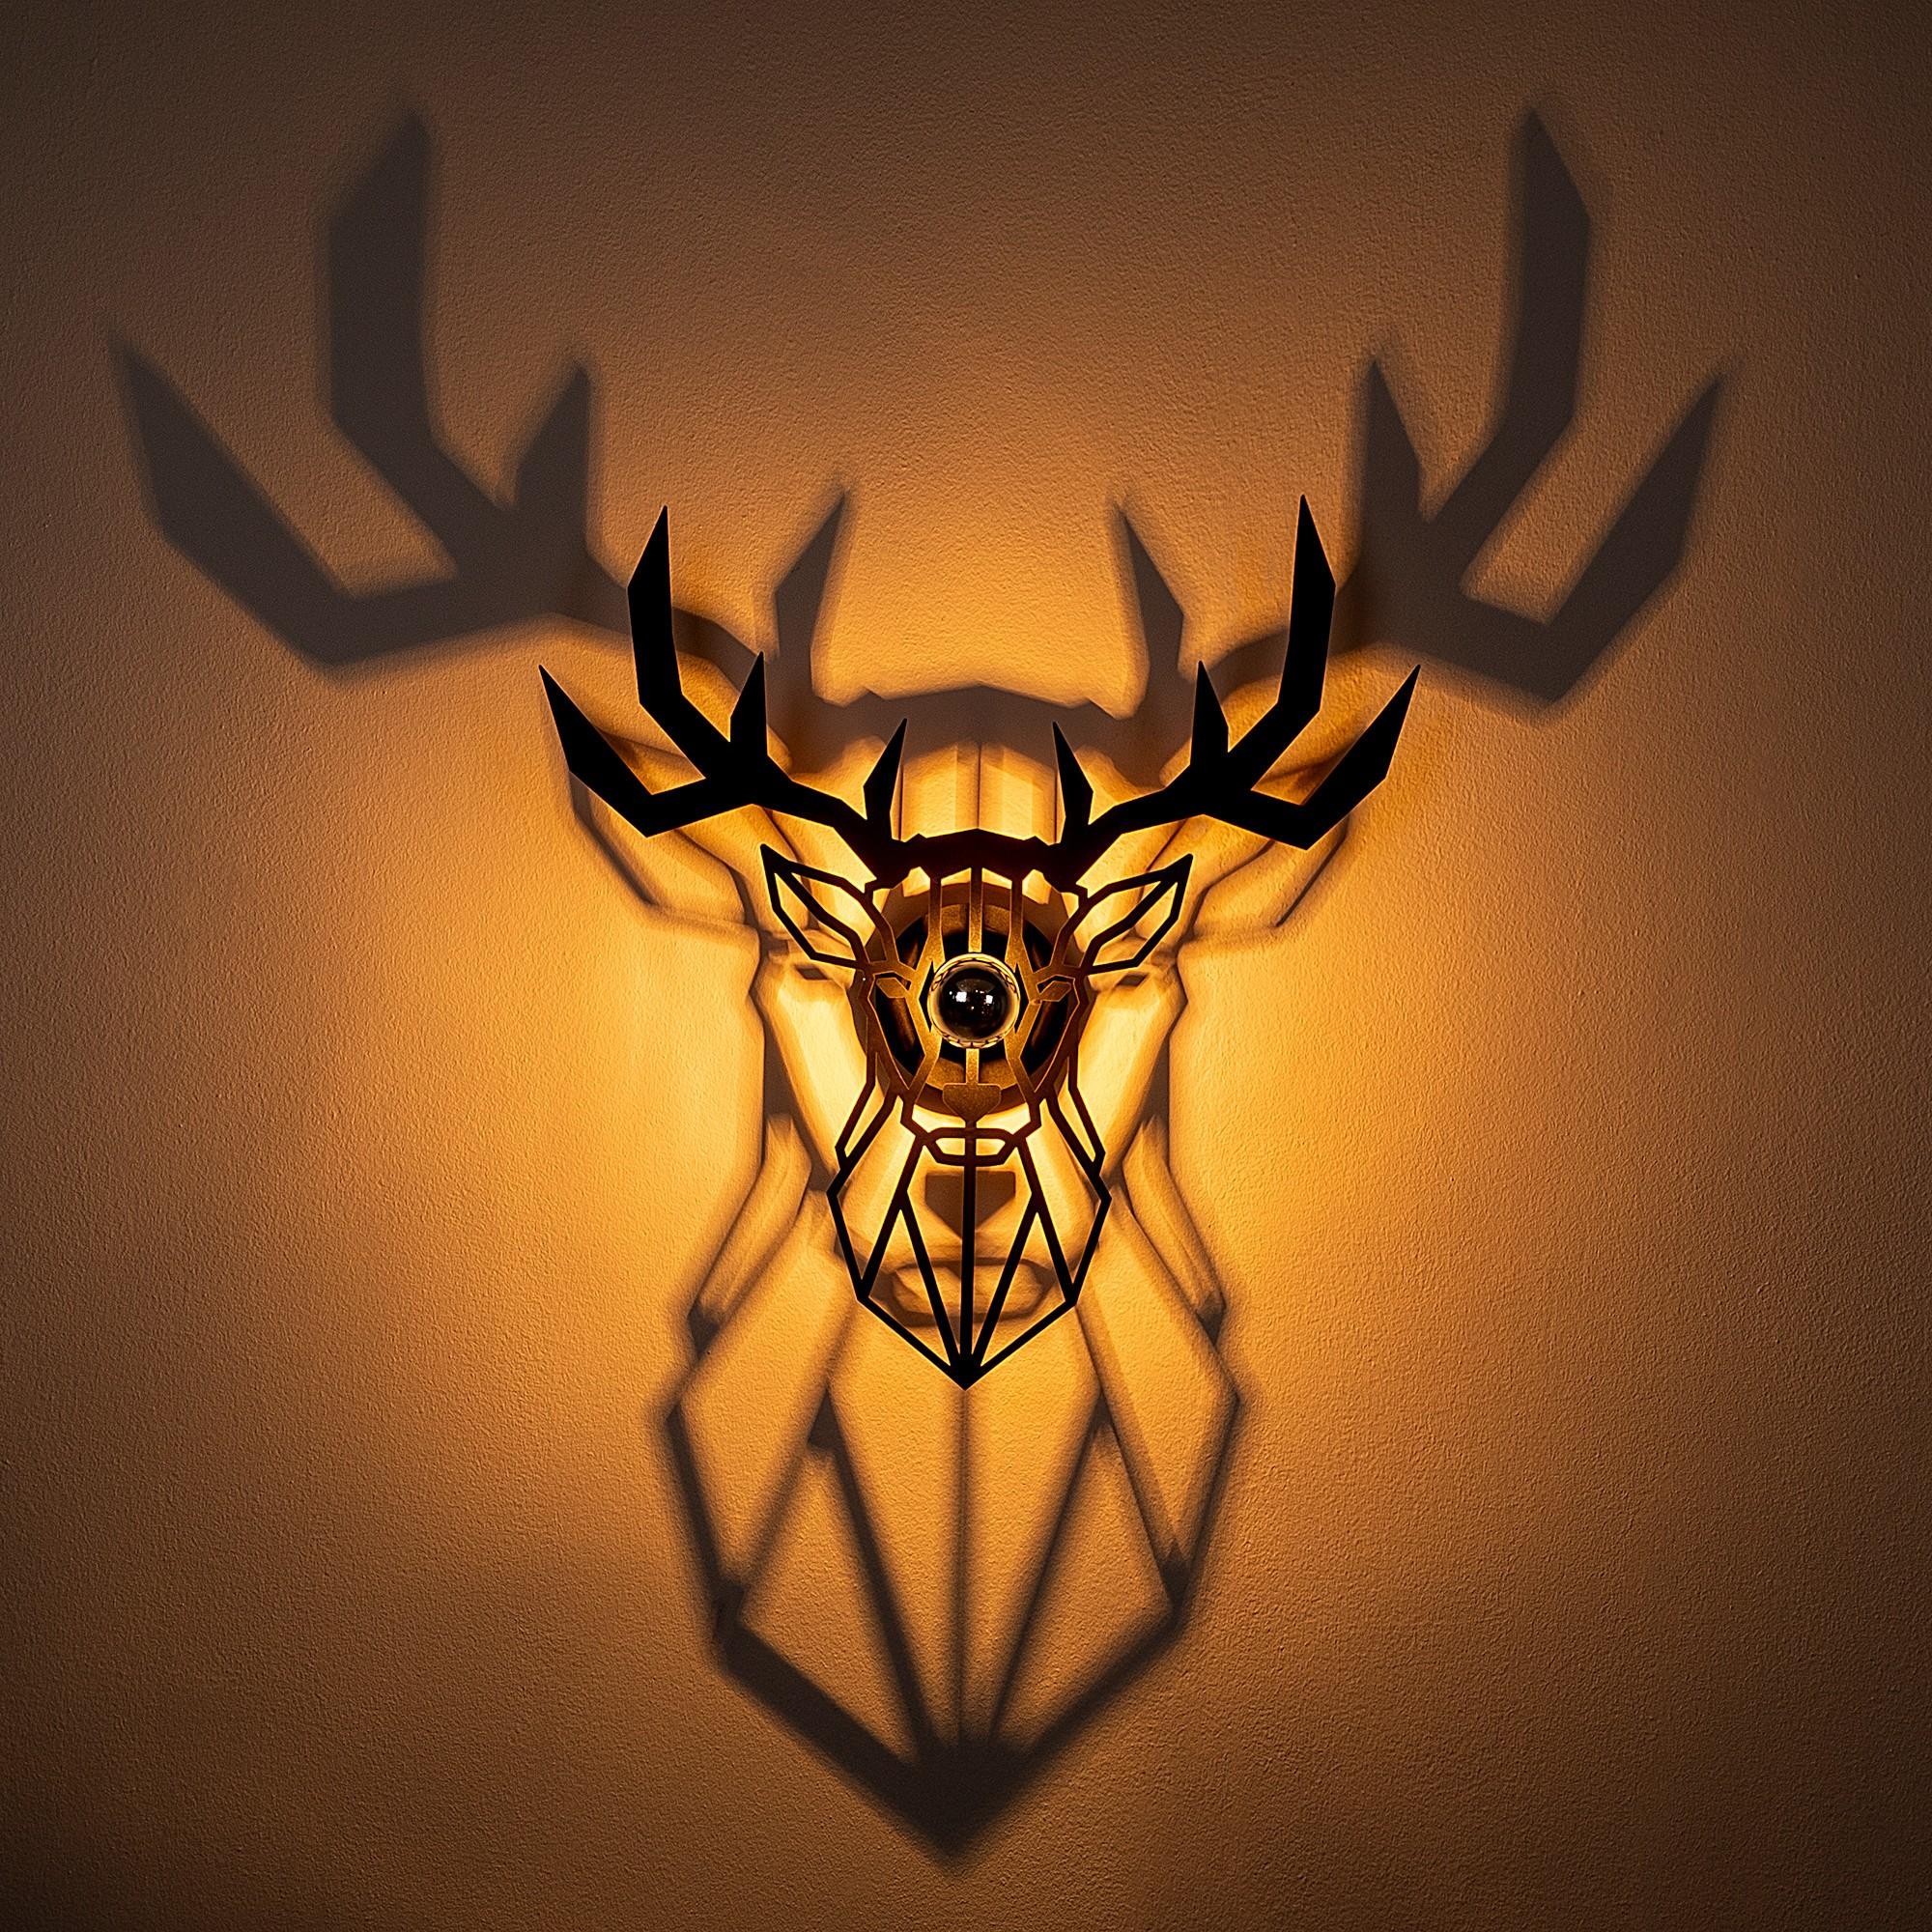 LED industriële wanddeco lamp dieren - Deer - dimbaar - E27 fitting - sfeerfoto incl. lamp